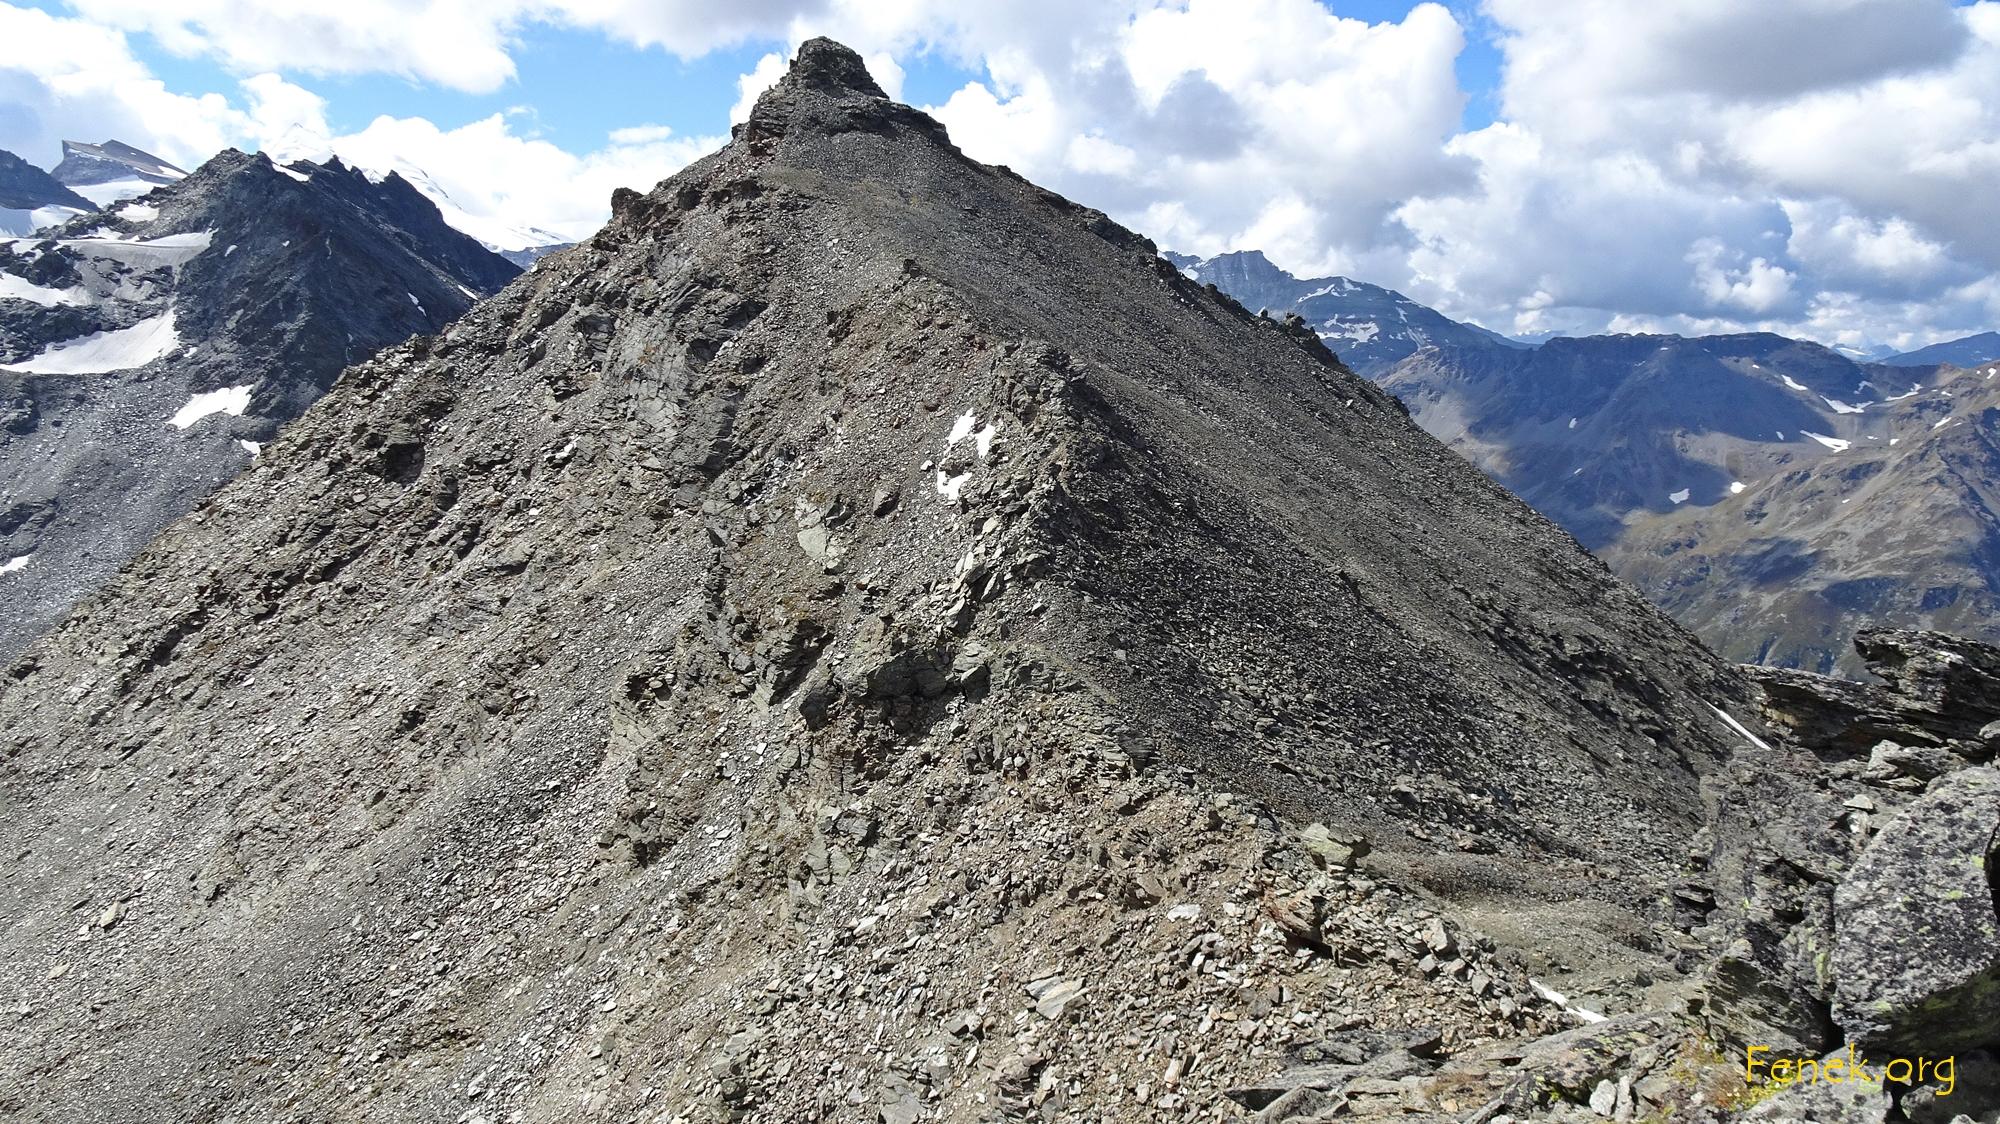 zurück im Joch ein Blick zurück - erster Gipfel geschafft.